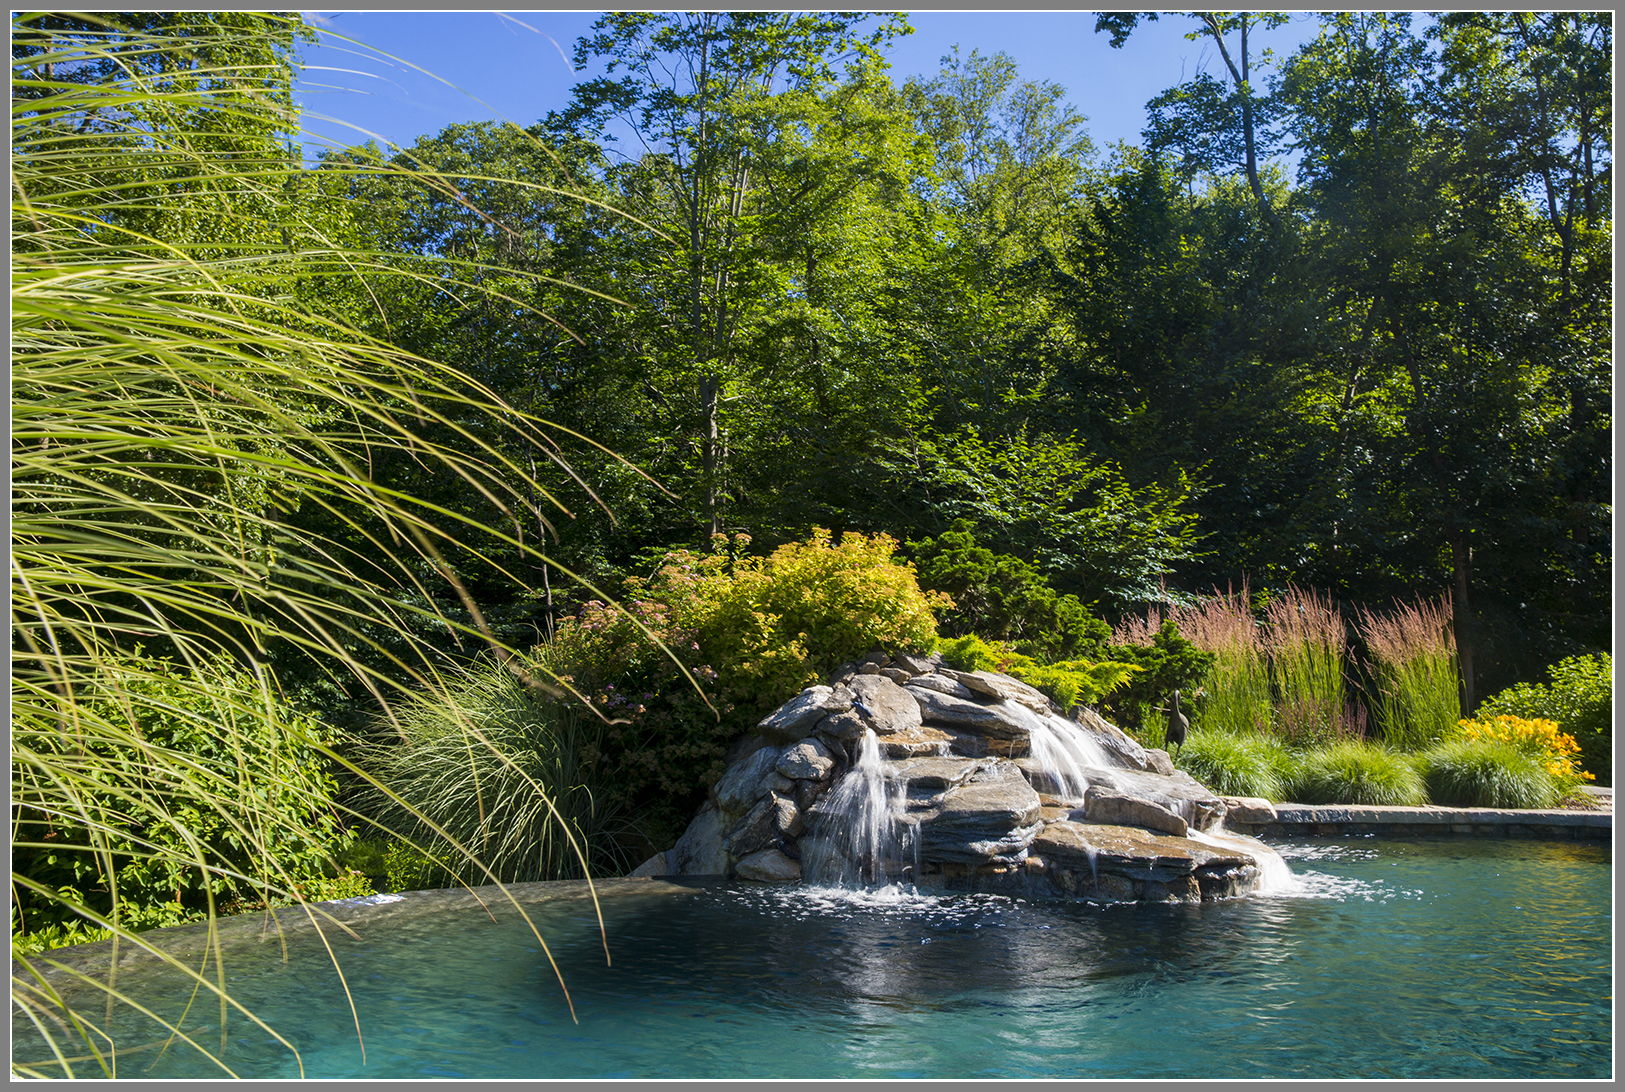 Infinity edge pool with waterfalls